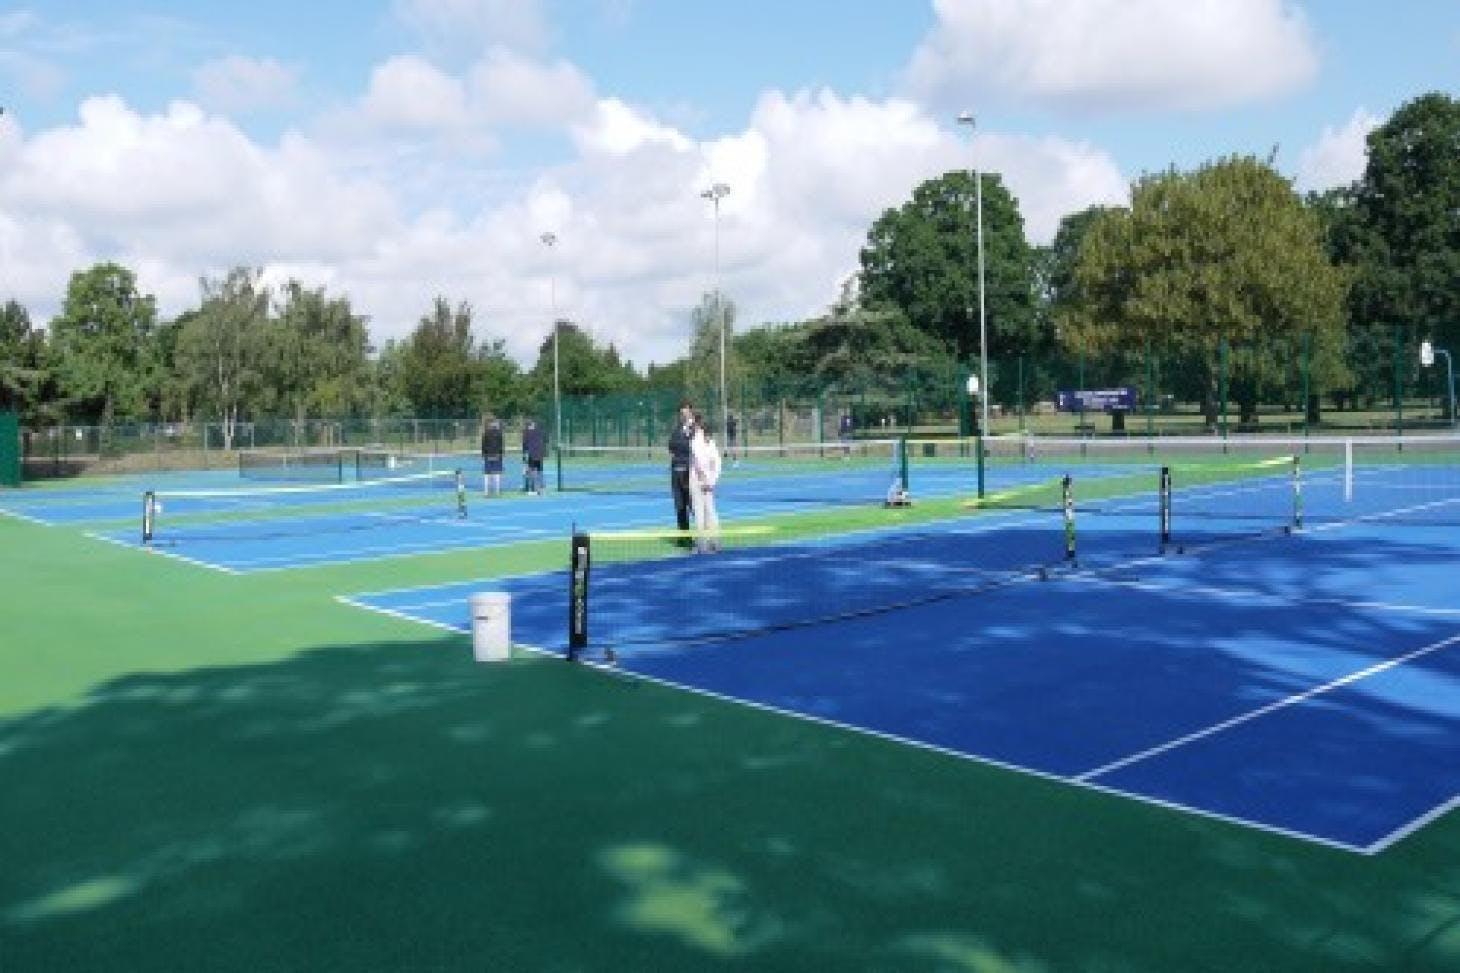 Bruce Castle Park Outdoor | Hard (macadam) tennis court